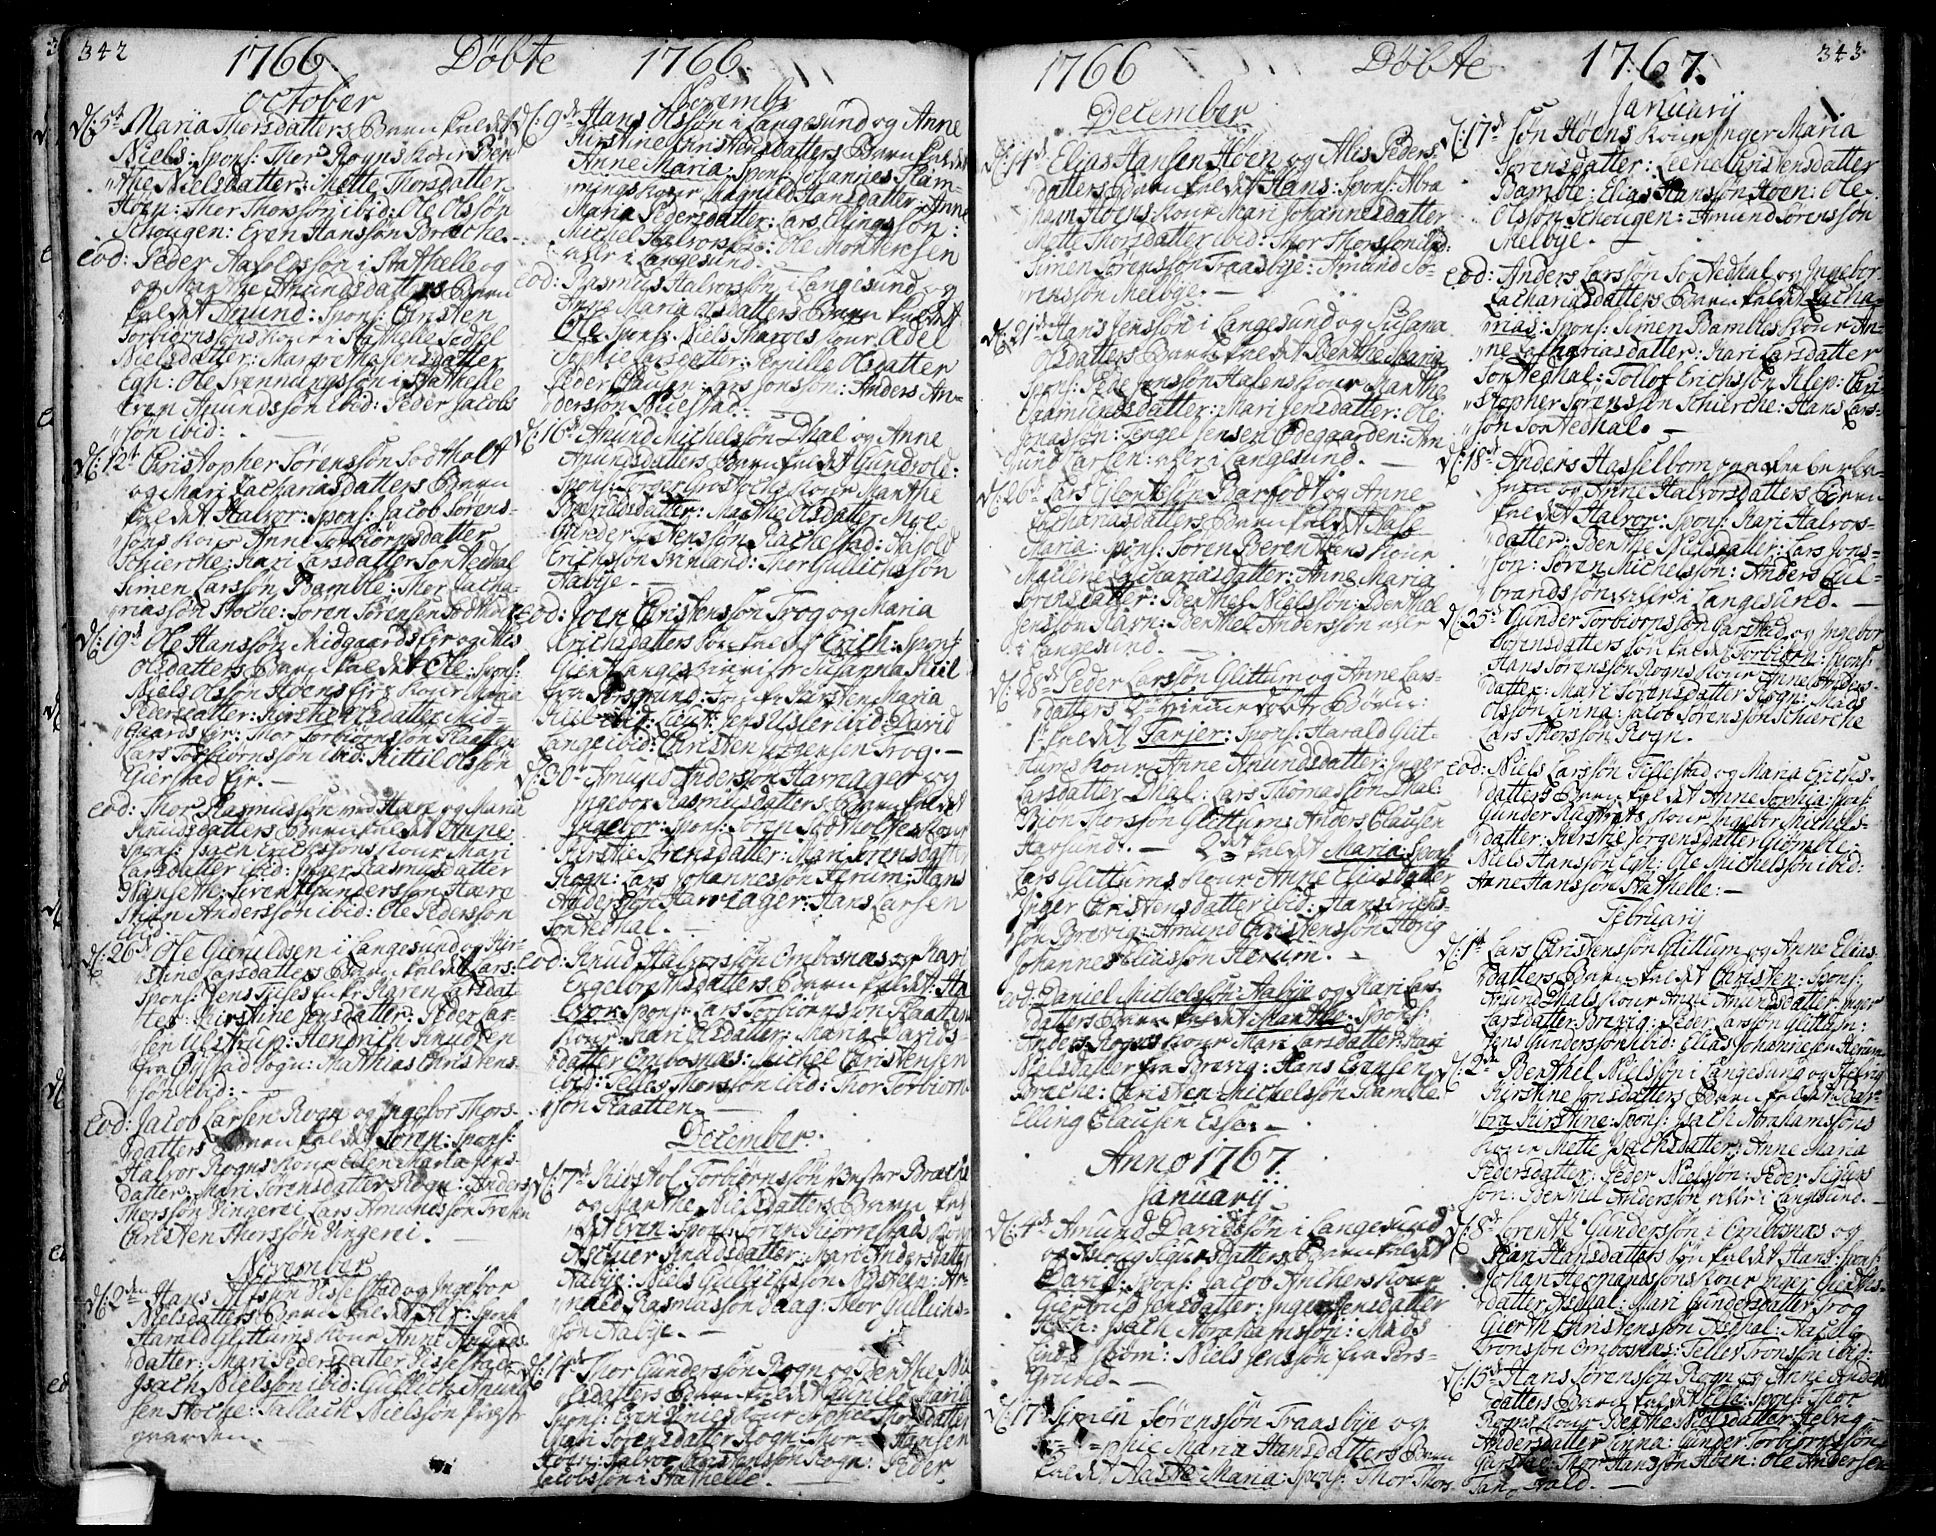 SAKO, Bamble kirkebøker, F/Fa/L0001: Ministerialbok nr. I 1, 1702-1774, s. 342-343